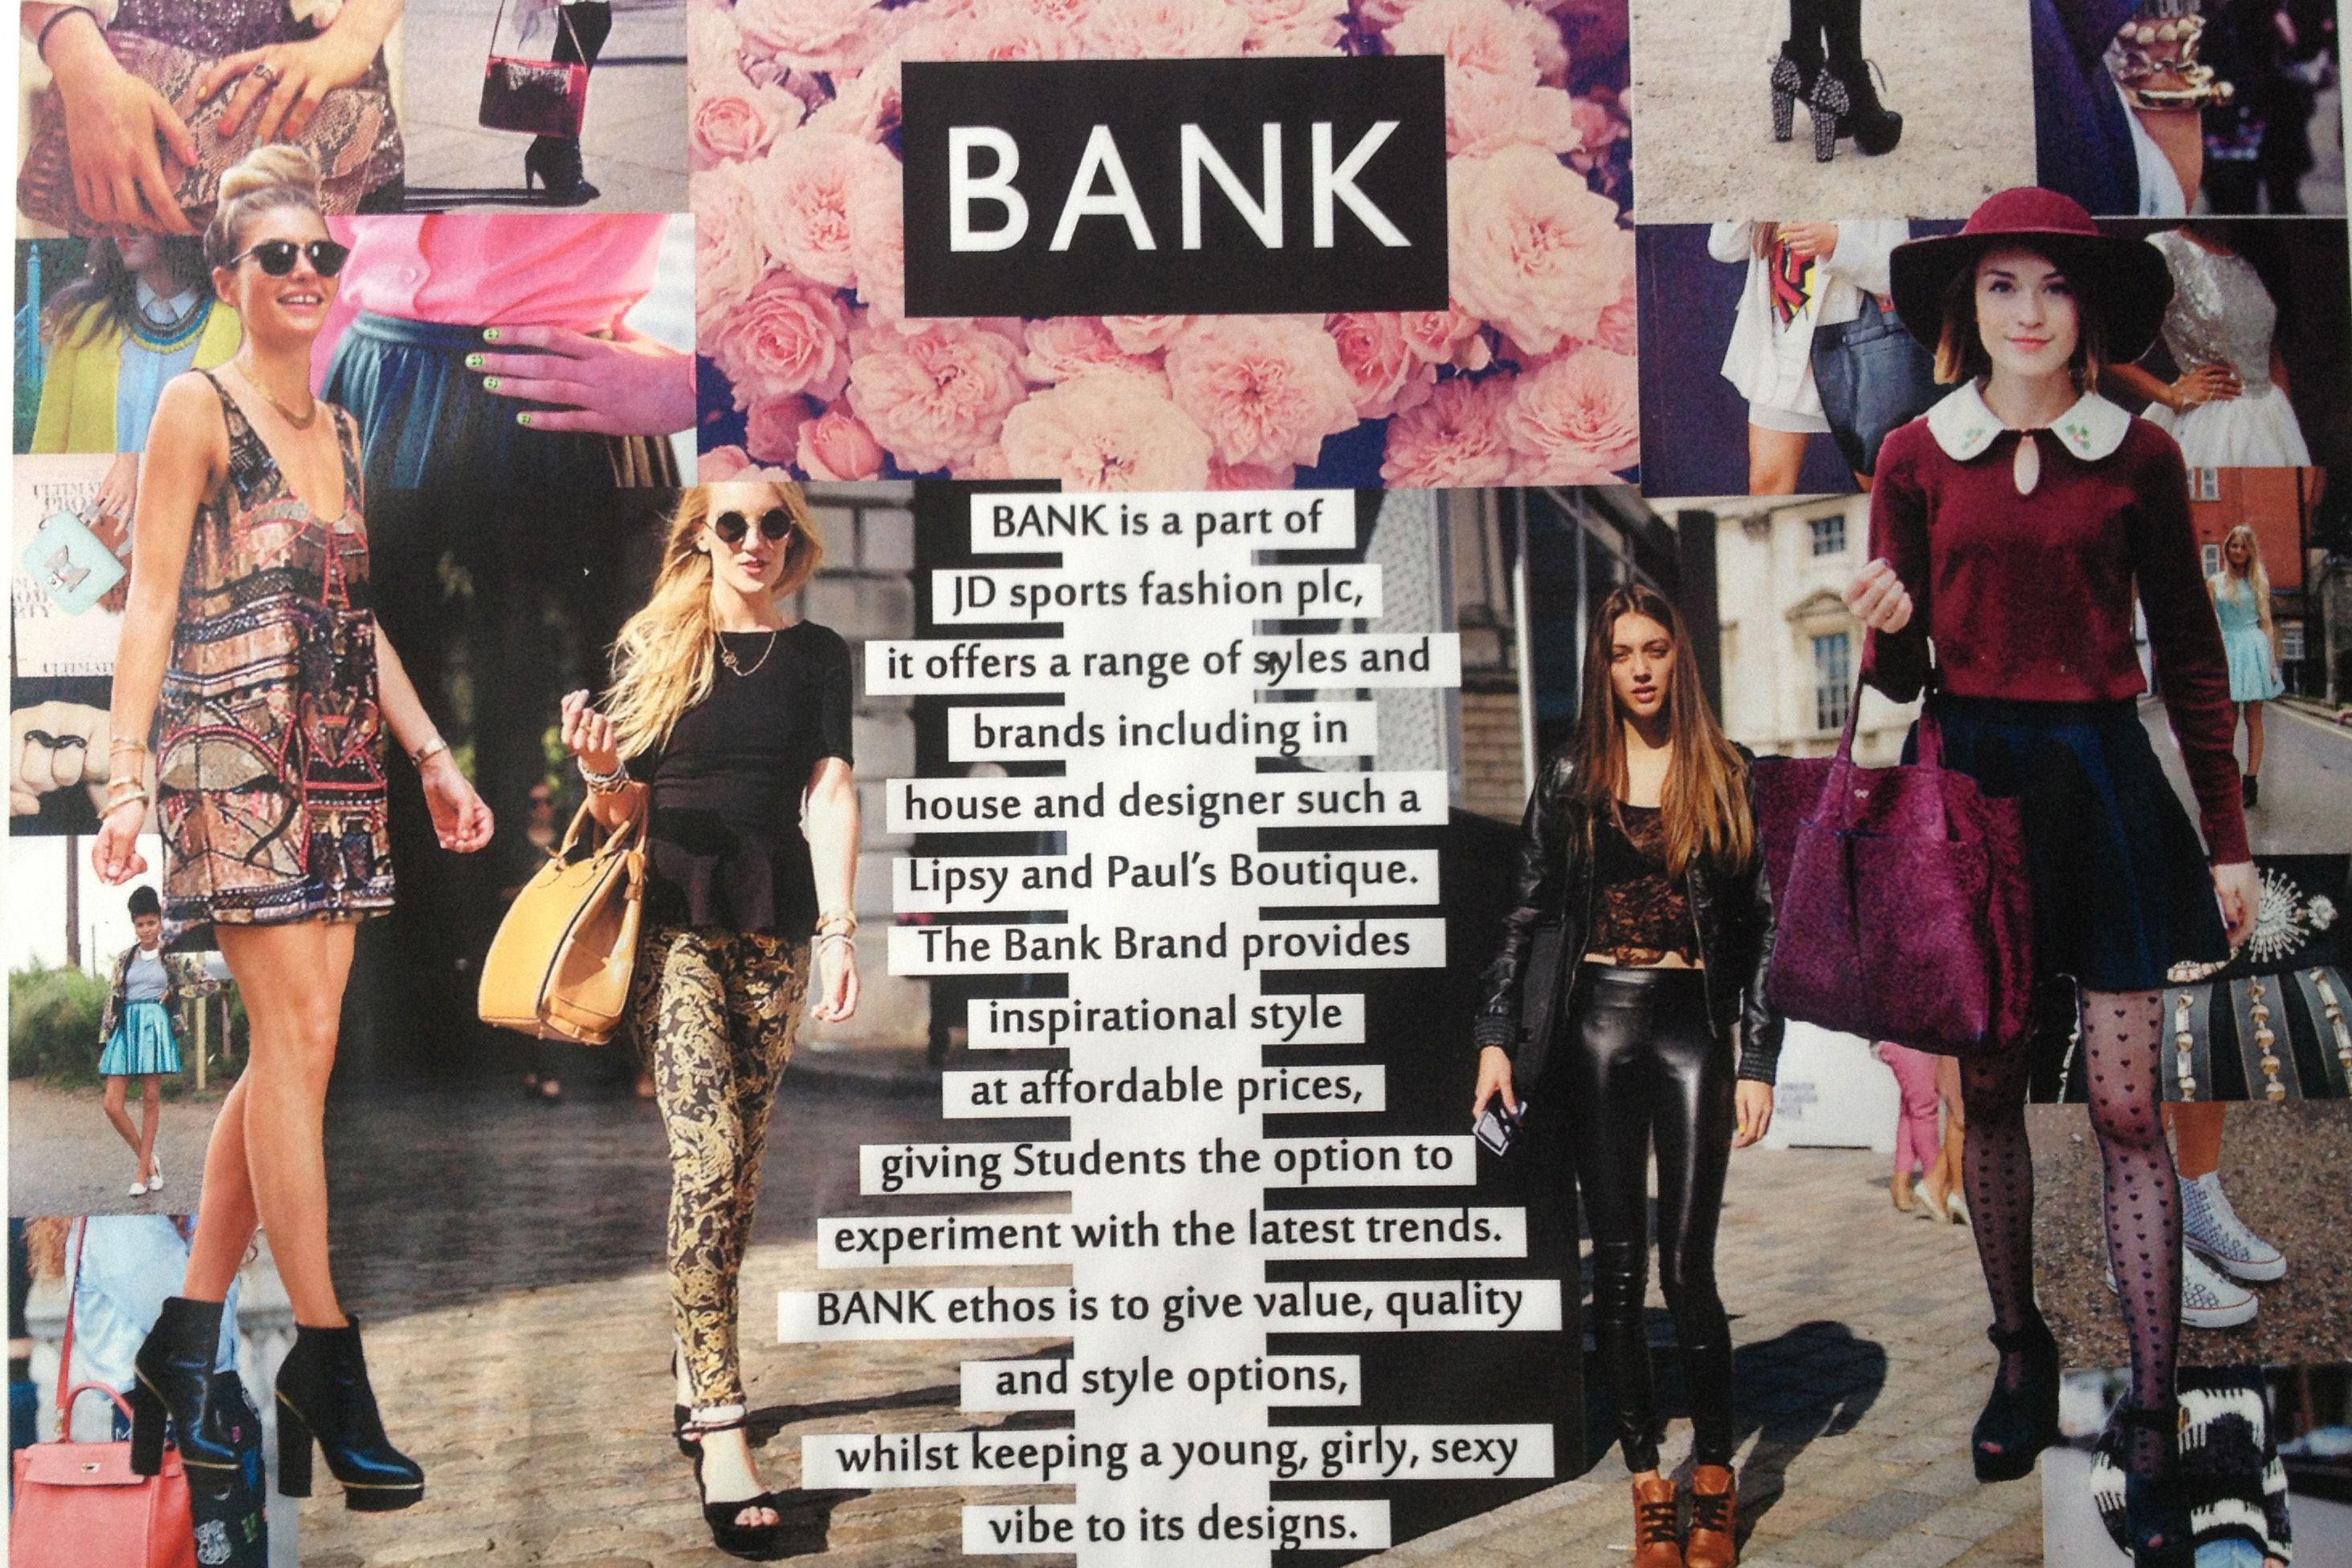 Brand Profile Board Online Marketing Trends Fashion Trending Moodboard Marketing Trends